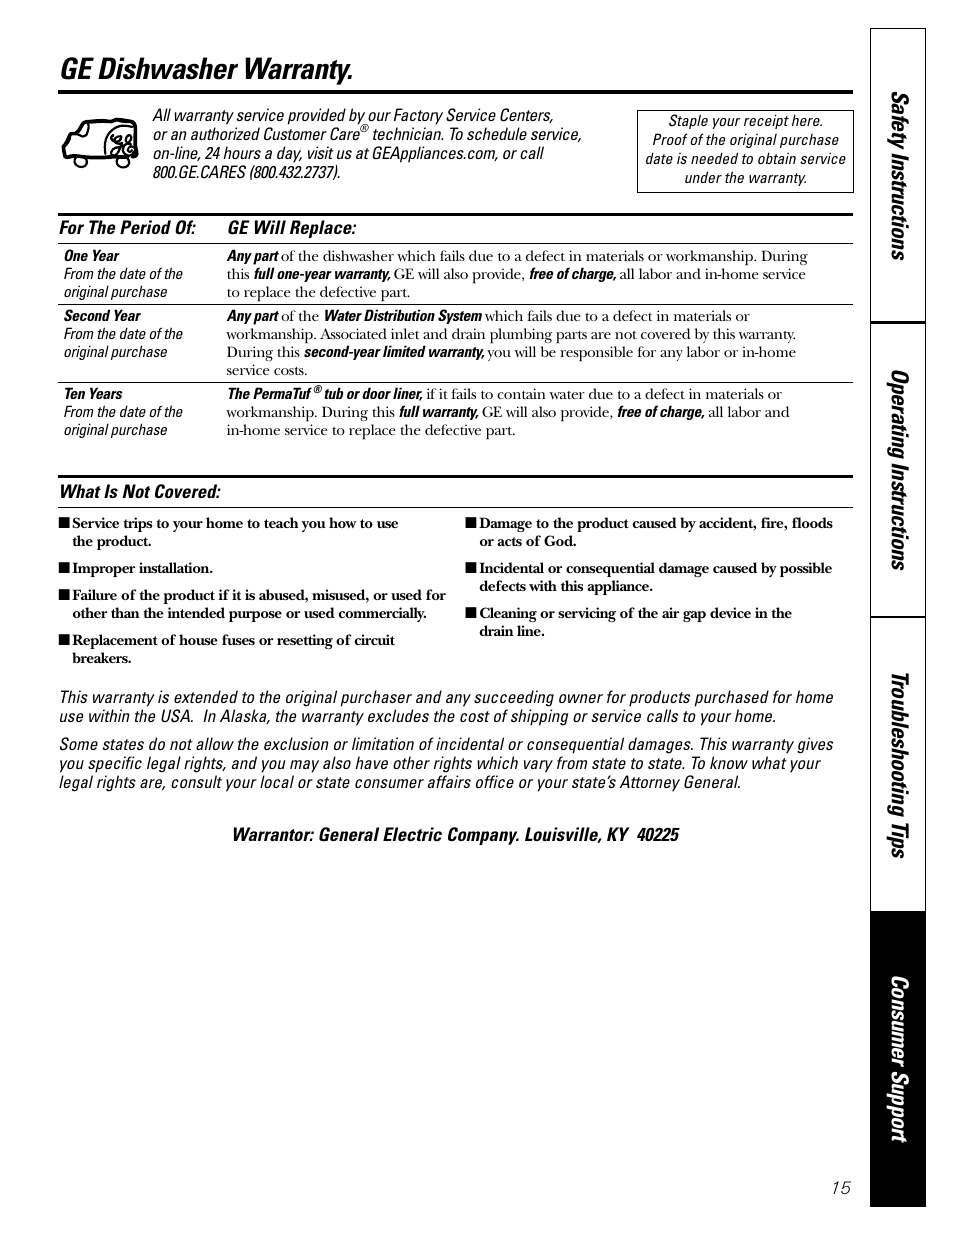 Warranty Ge Dishwasher Edw1500 User Manual